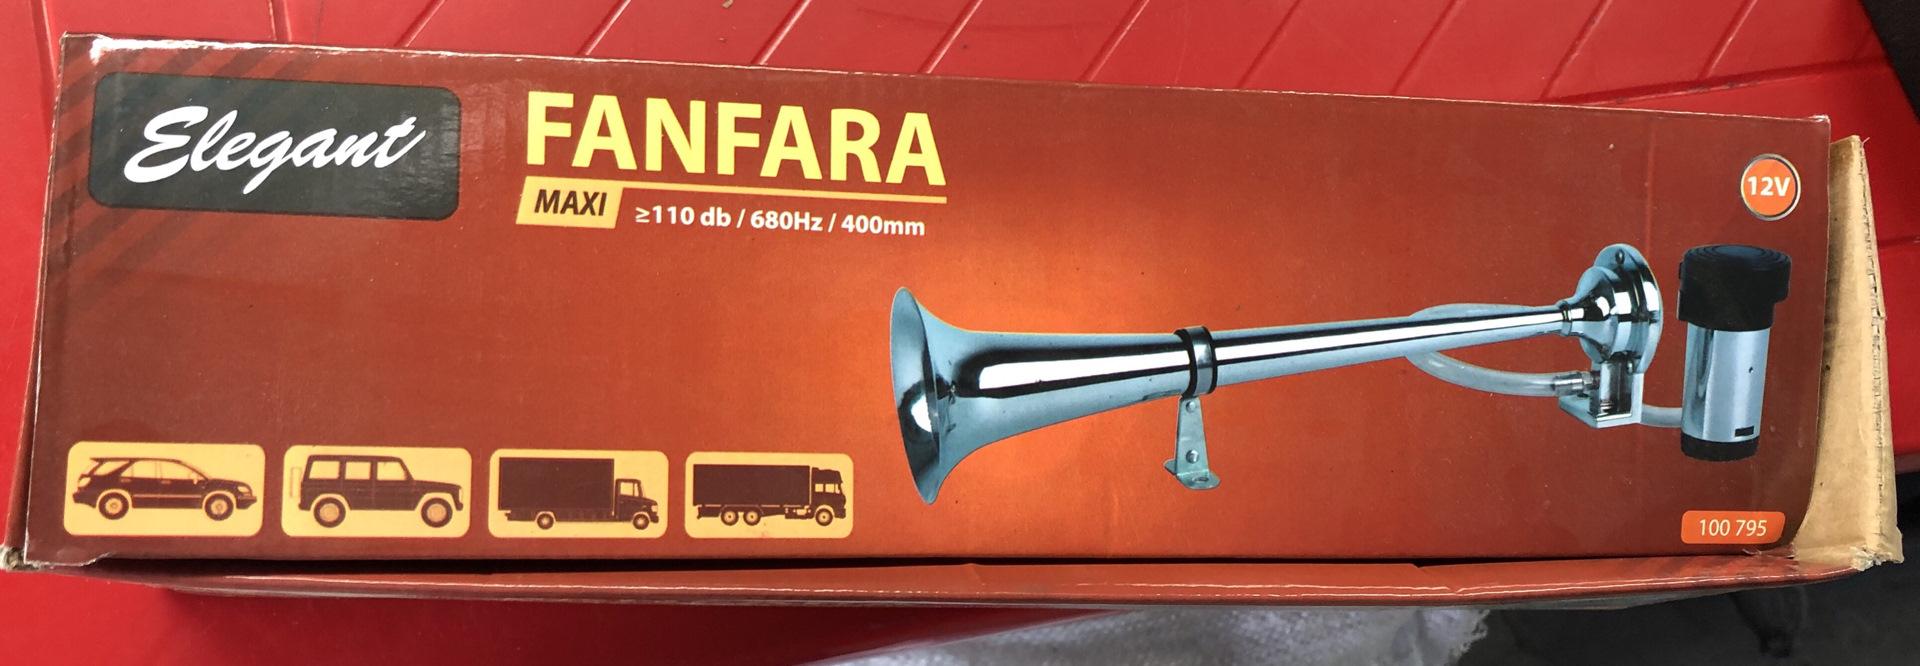 Фанфара — википедия